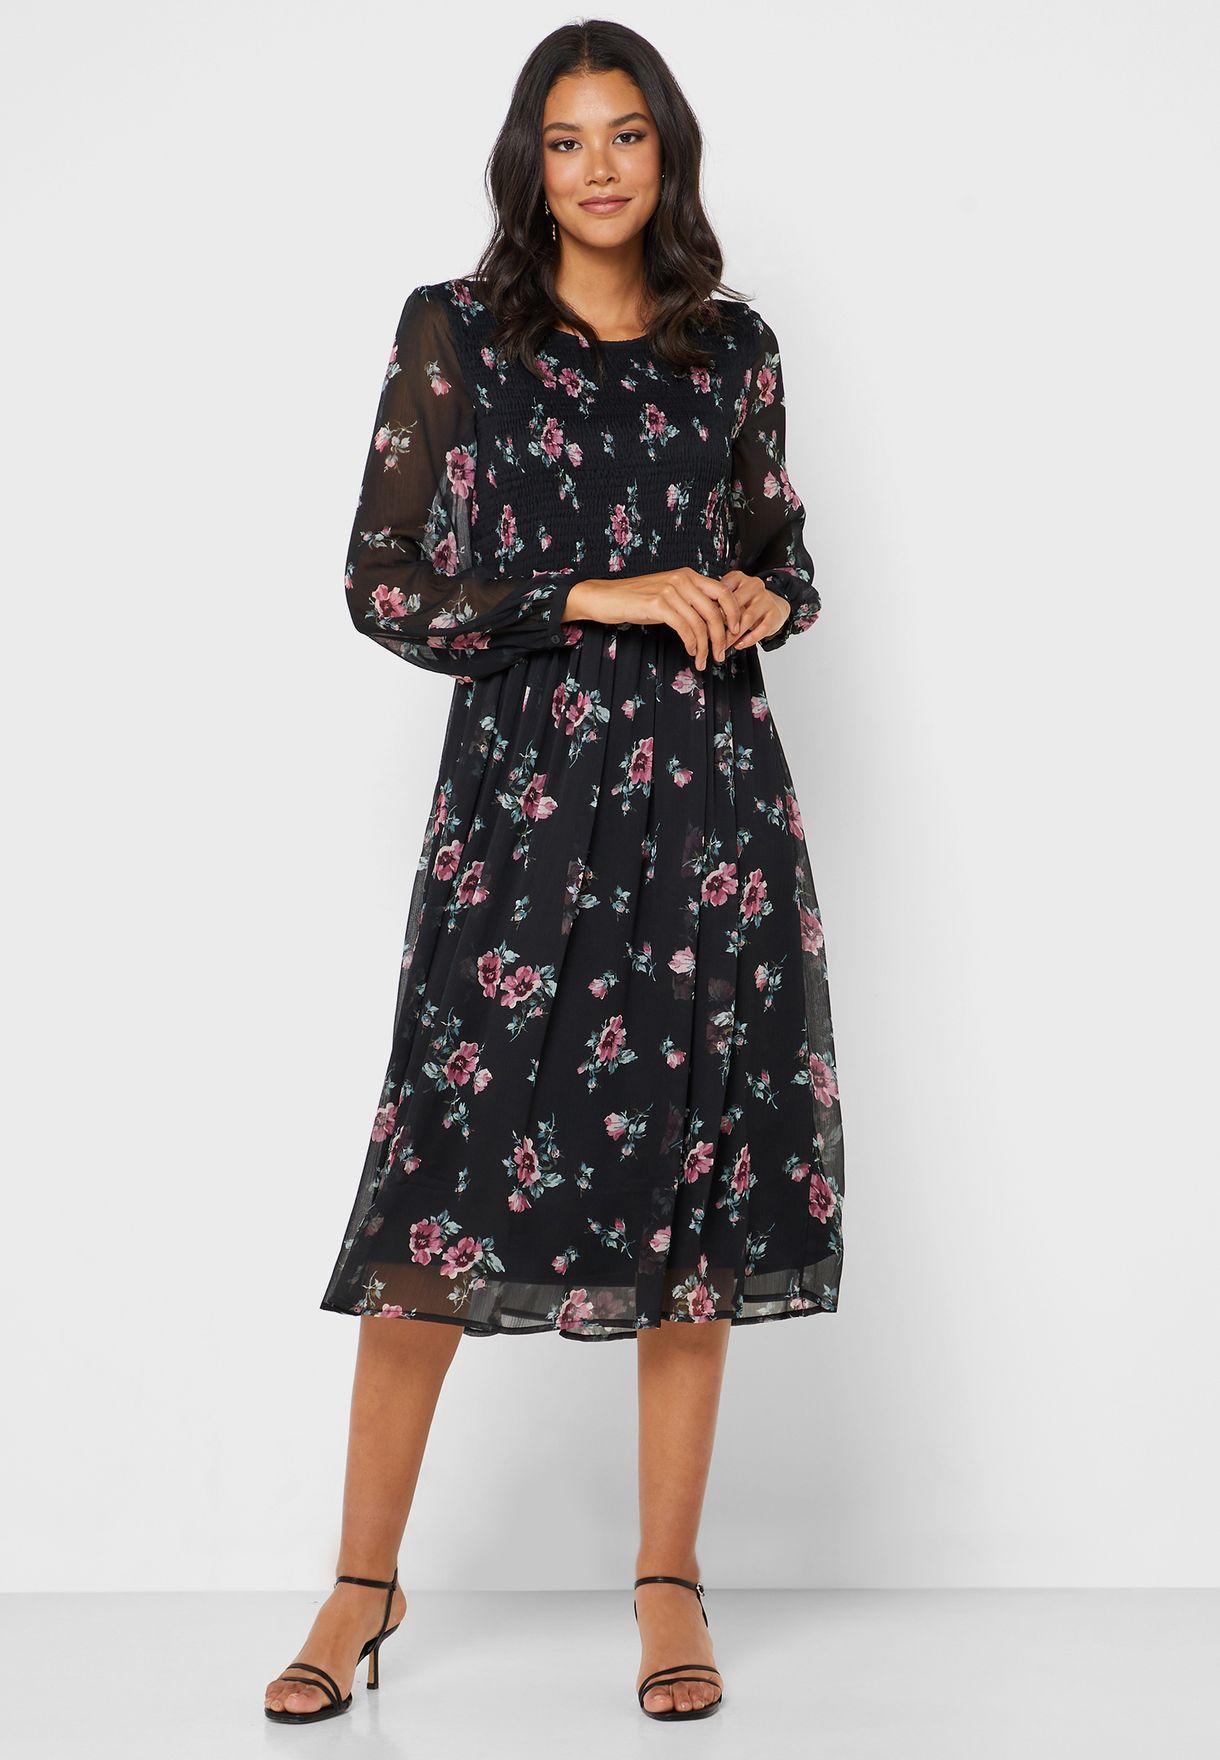 Floral Print Sheer Sleeve Skater Dress